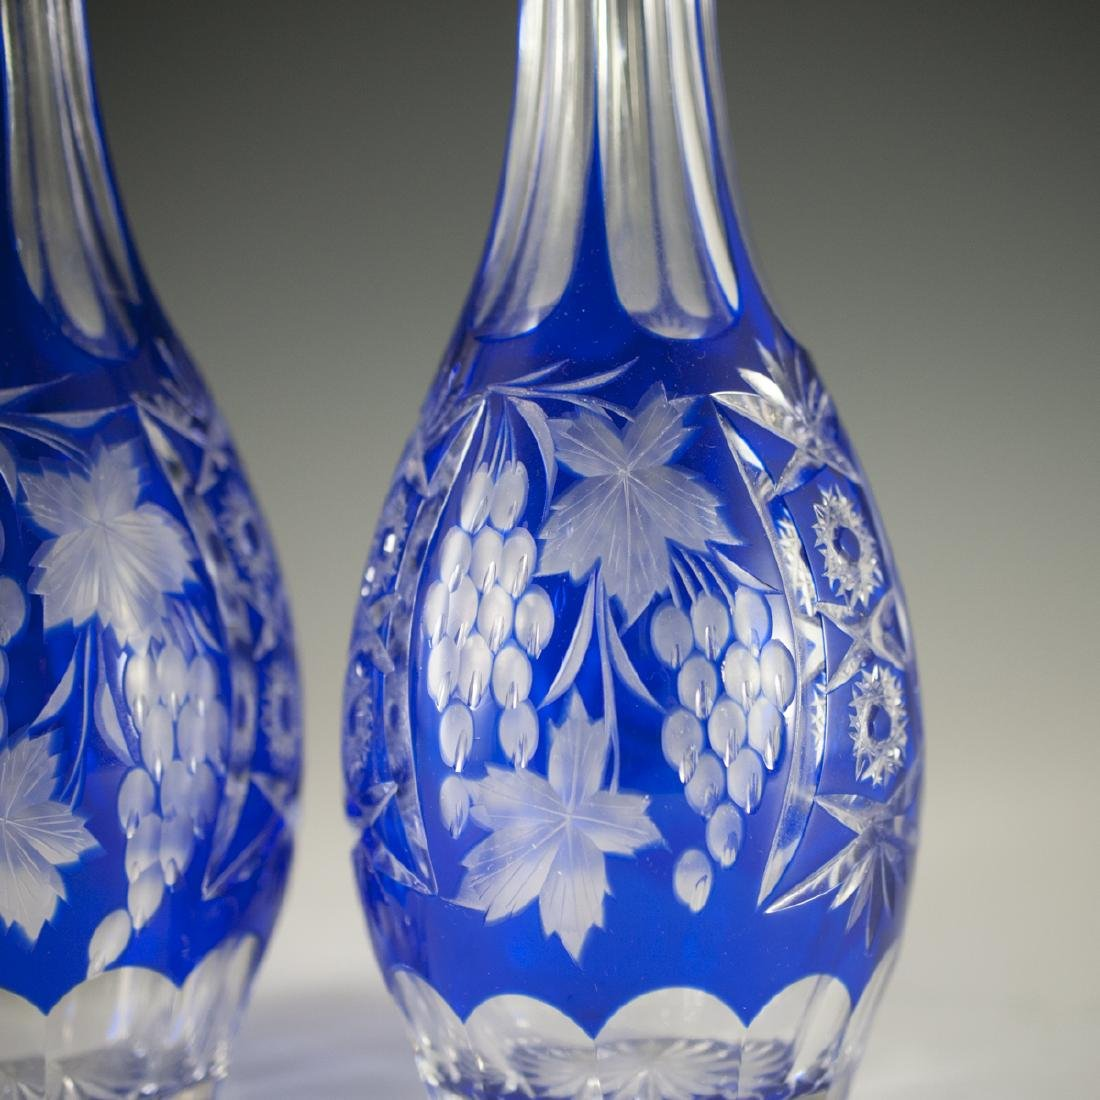 Bohemian Cobalt Crystal Decanters - 2